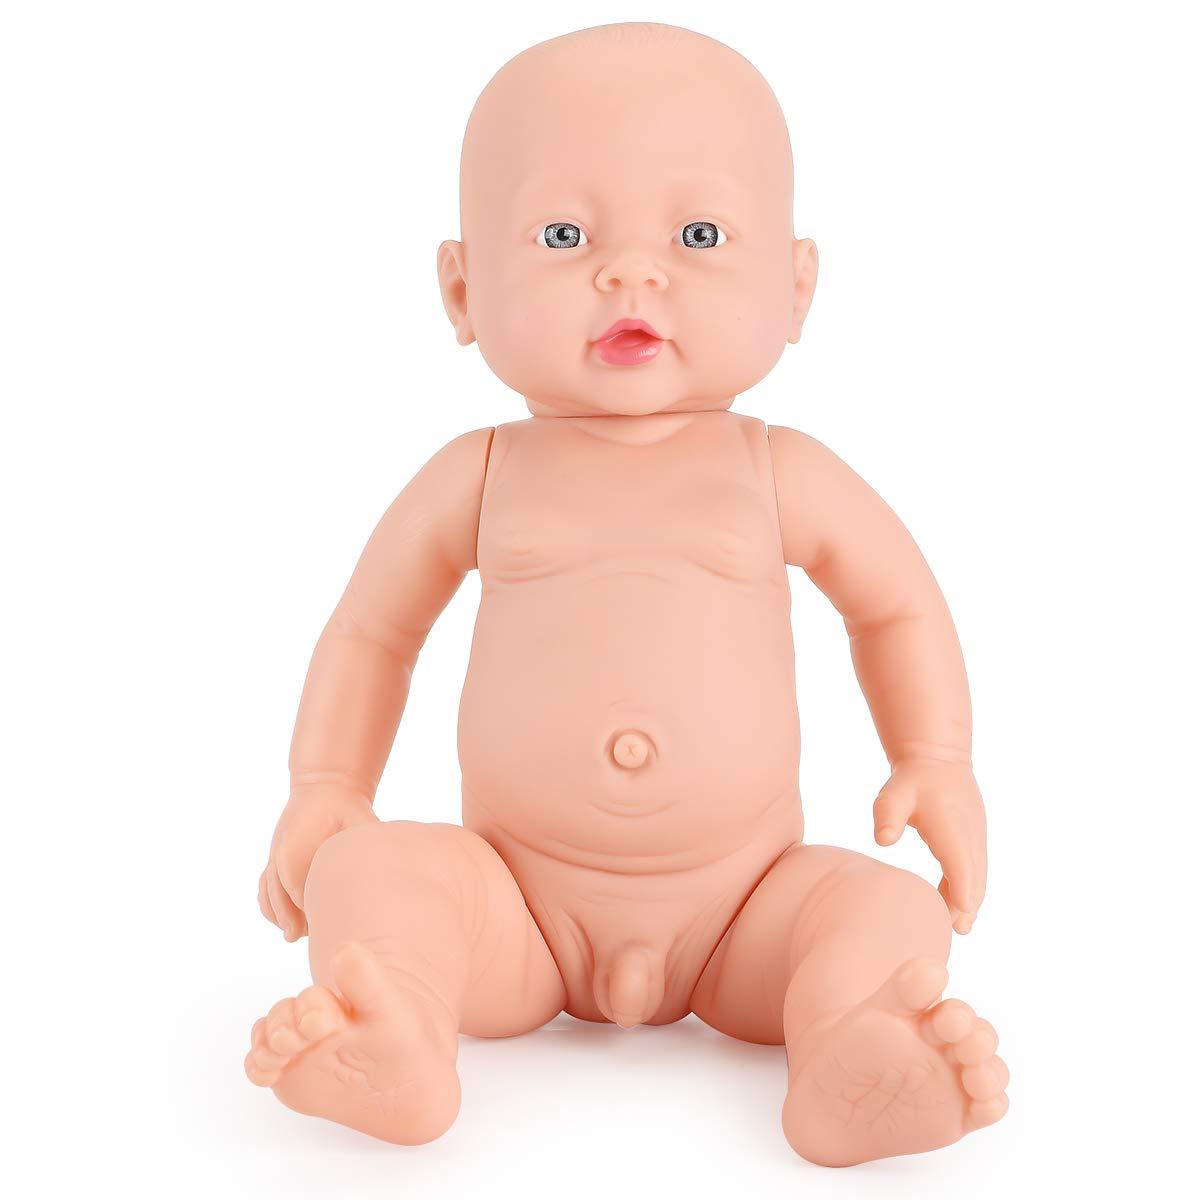 Eligara 16'' Soft Doll, Soft Naked Dolls, High Simulation Non -Toxic Latex Rotocast Miniature Realistic Full Body Doll